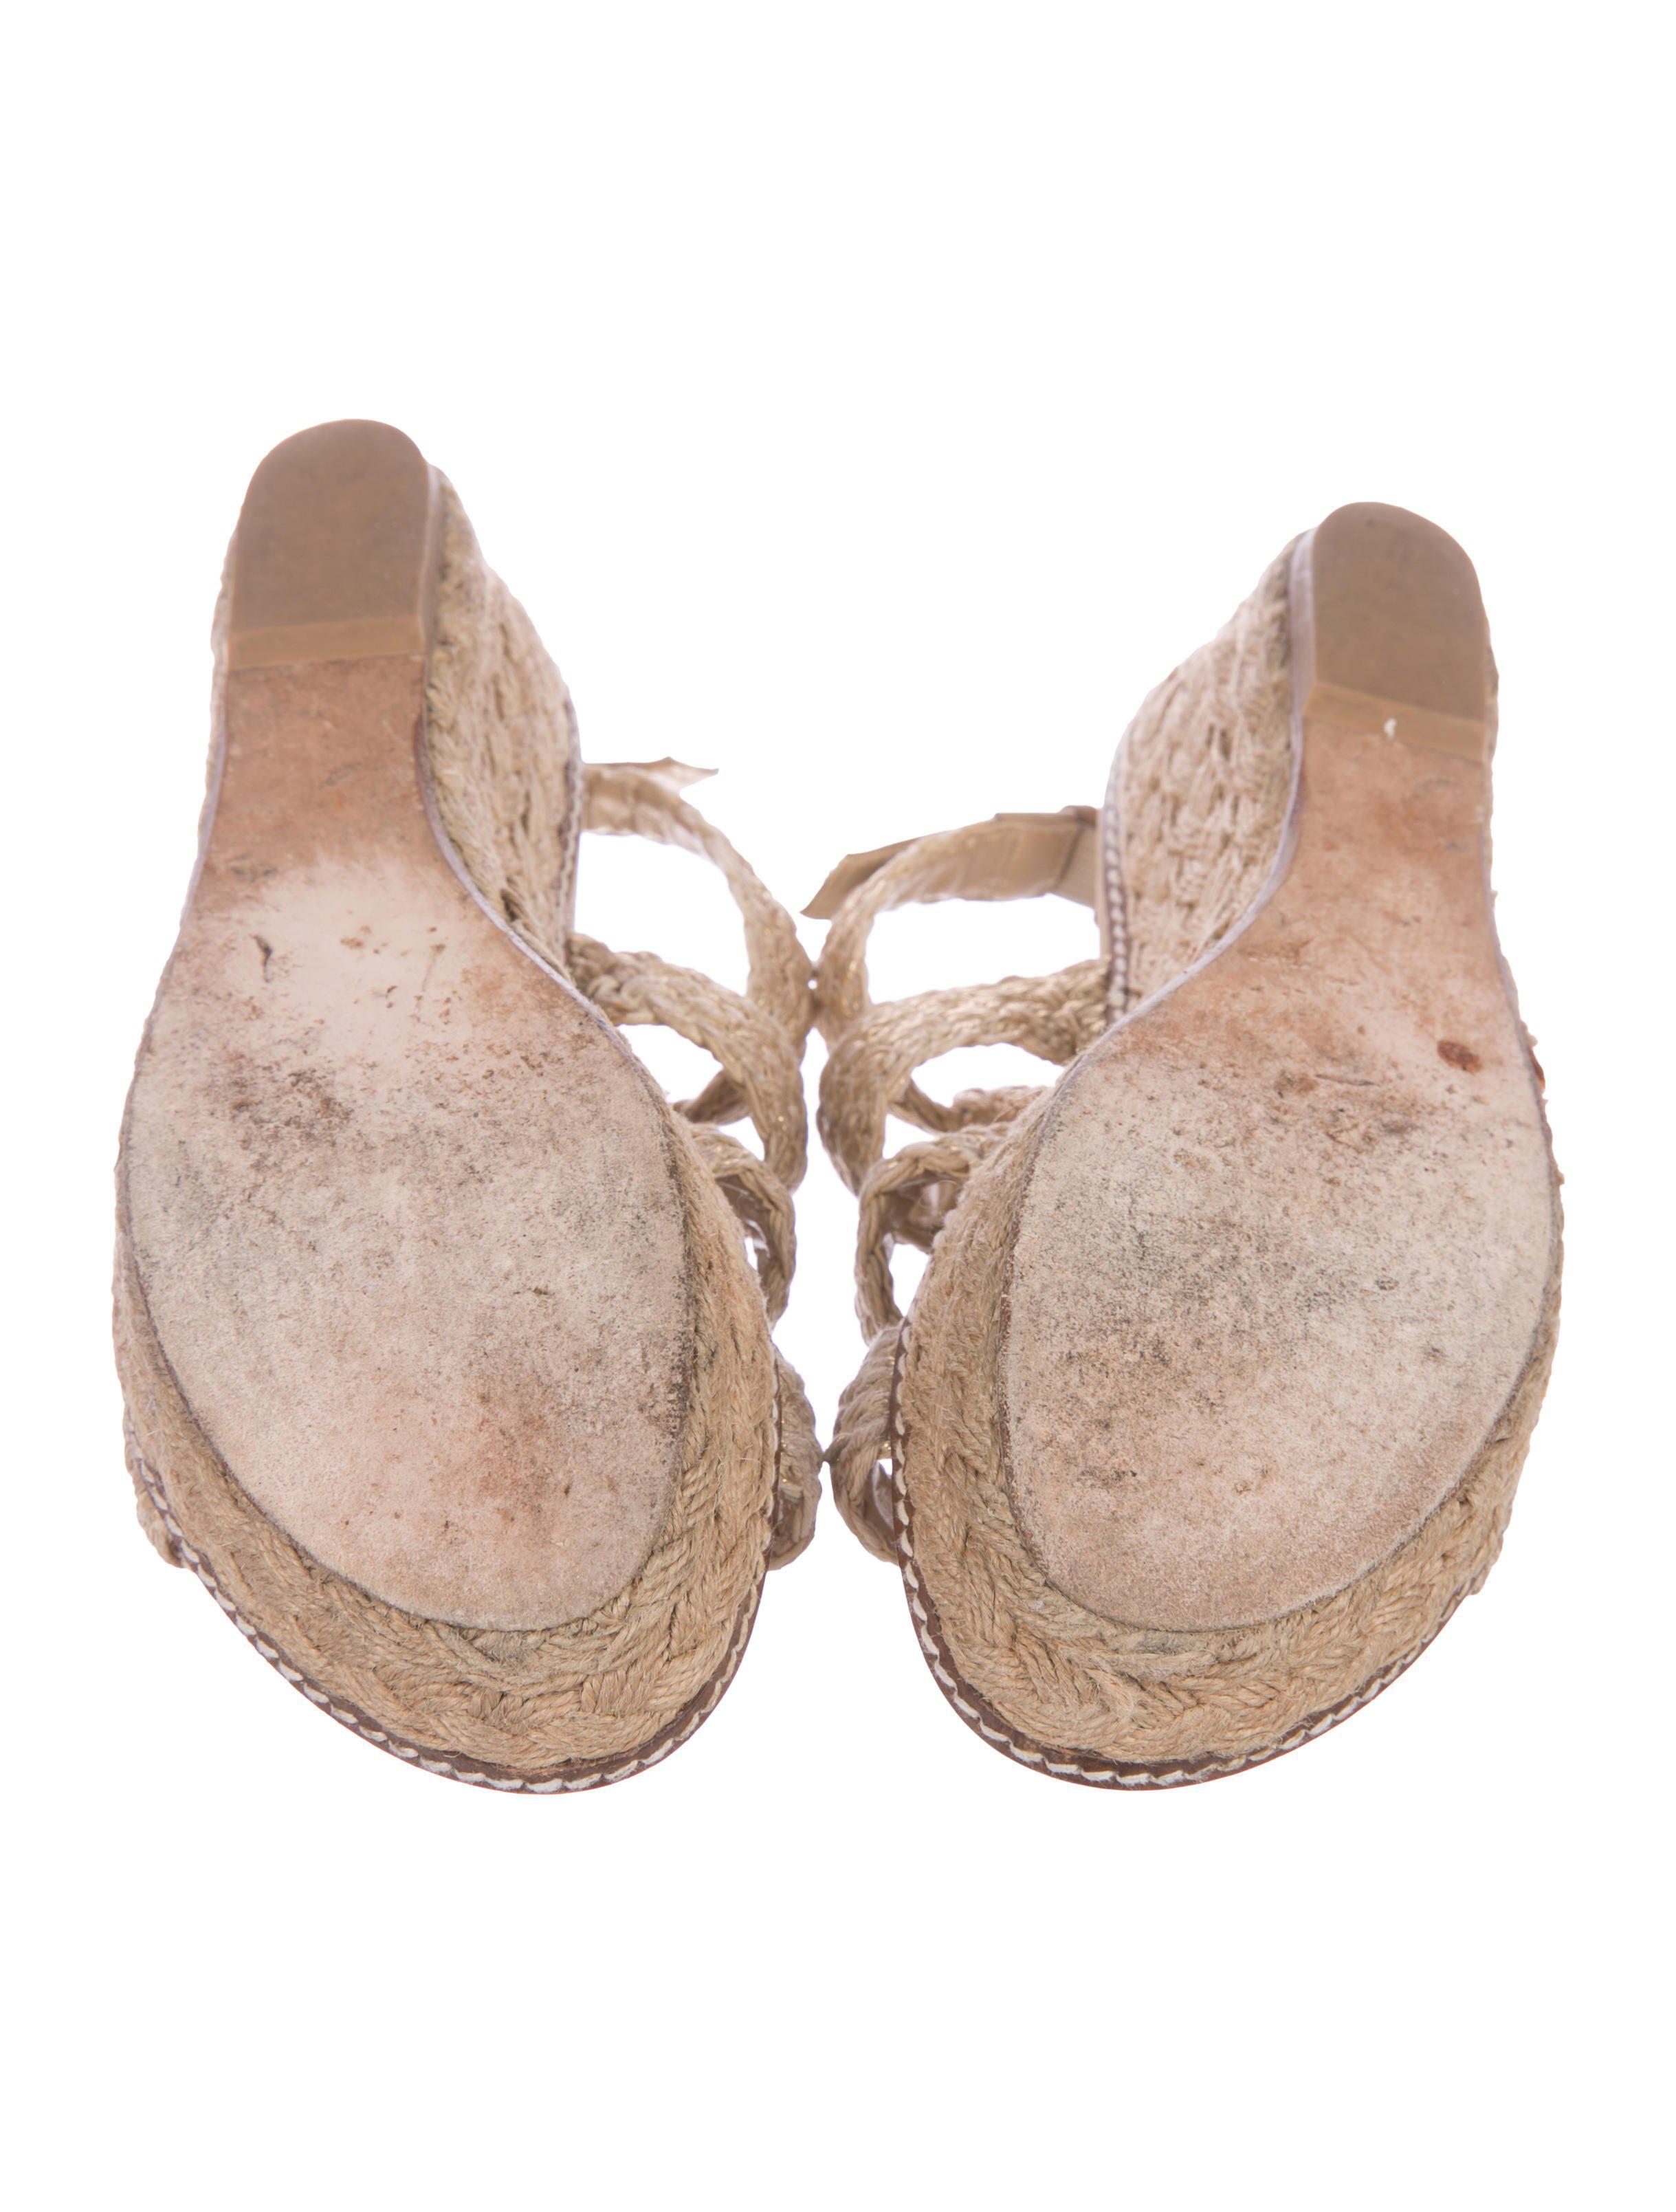 b40d828d1 Lyst - Stuart Weitzman Woven Wedge Sandals Gold in Metallic